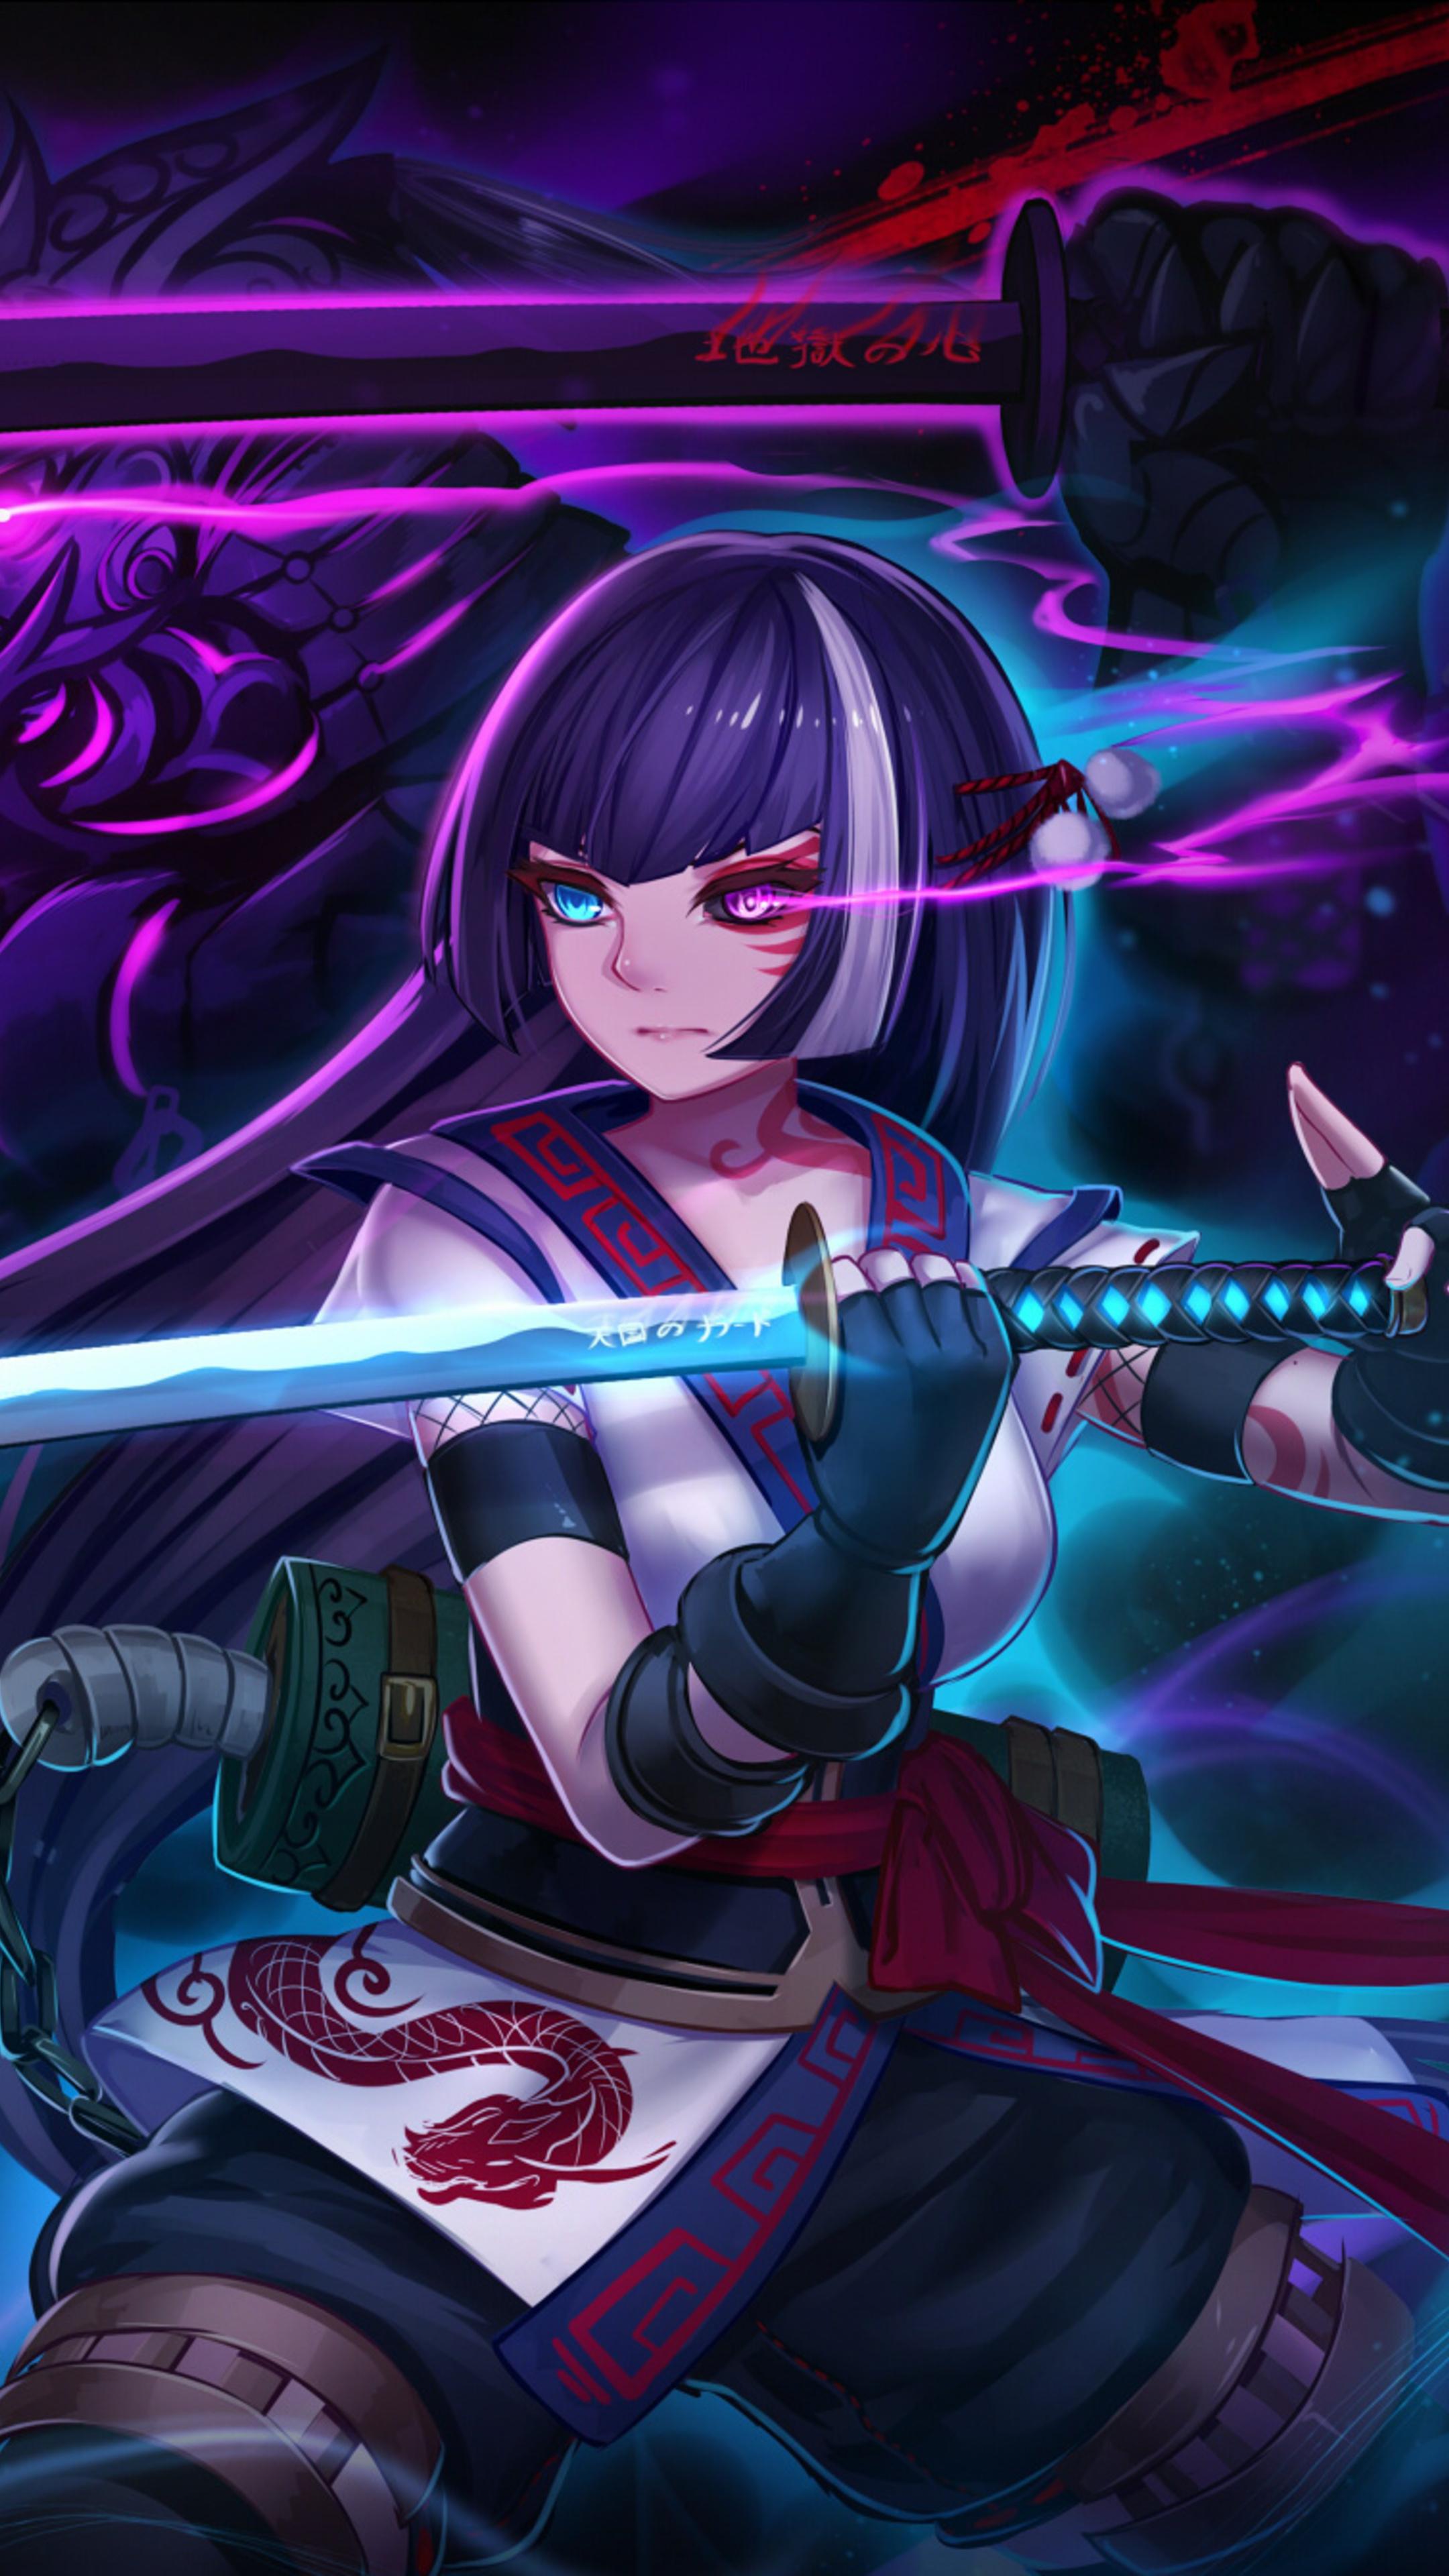 Indian Cute Girl Wallpaper 2160x3840 Anime Warrior Girl Sony Xperia X Xz Z5 Premium